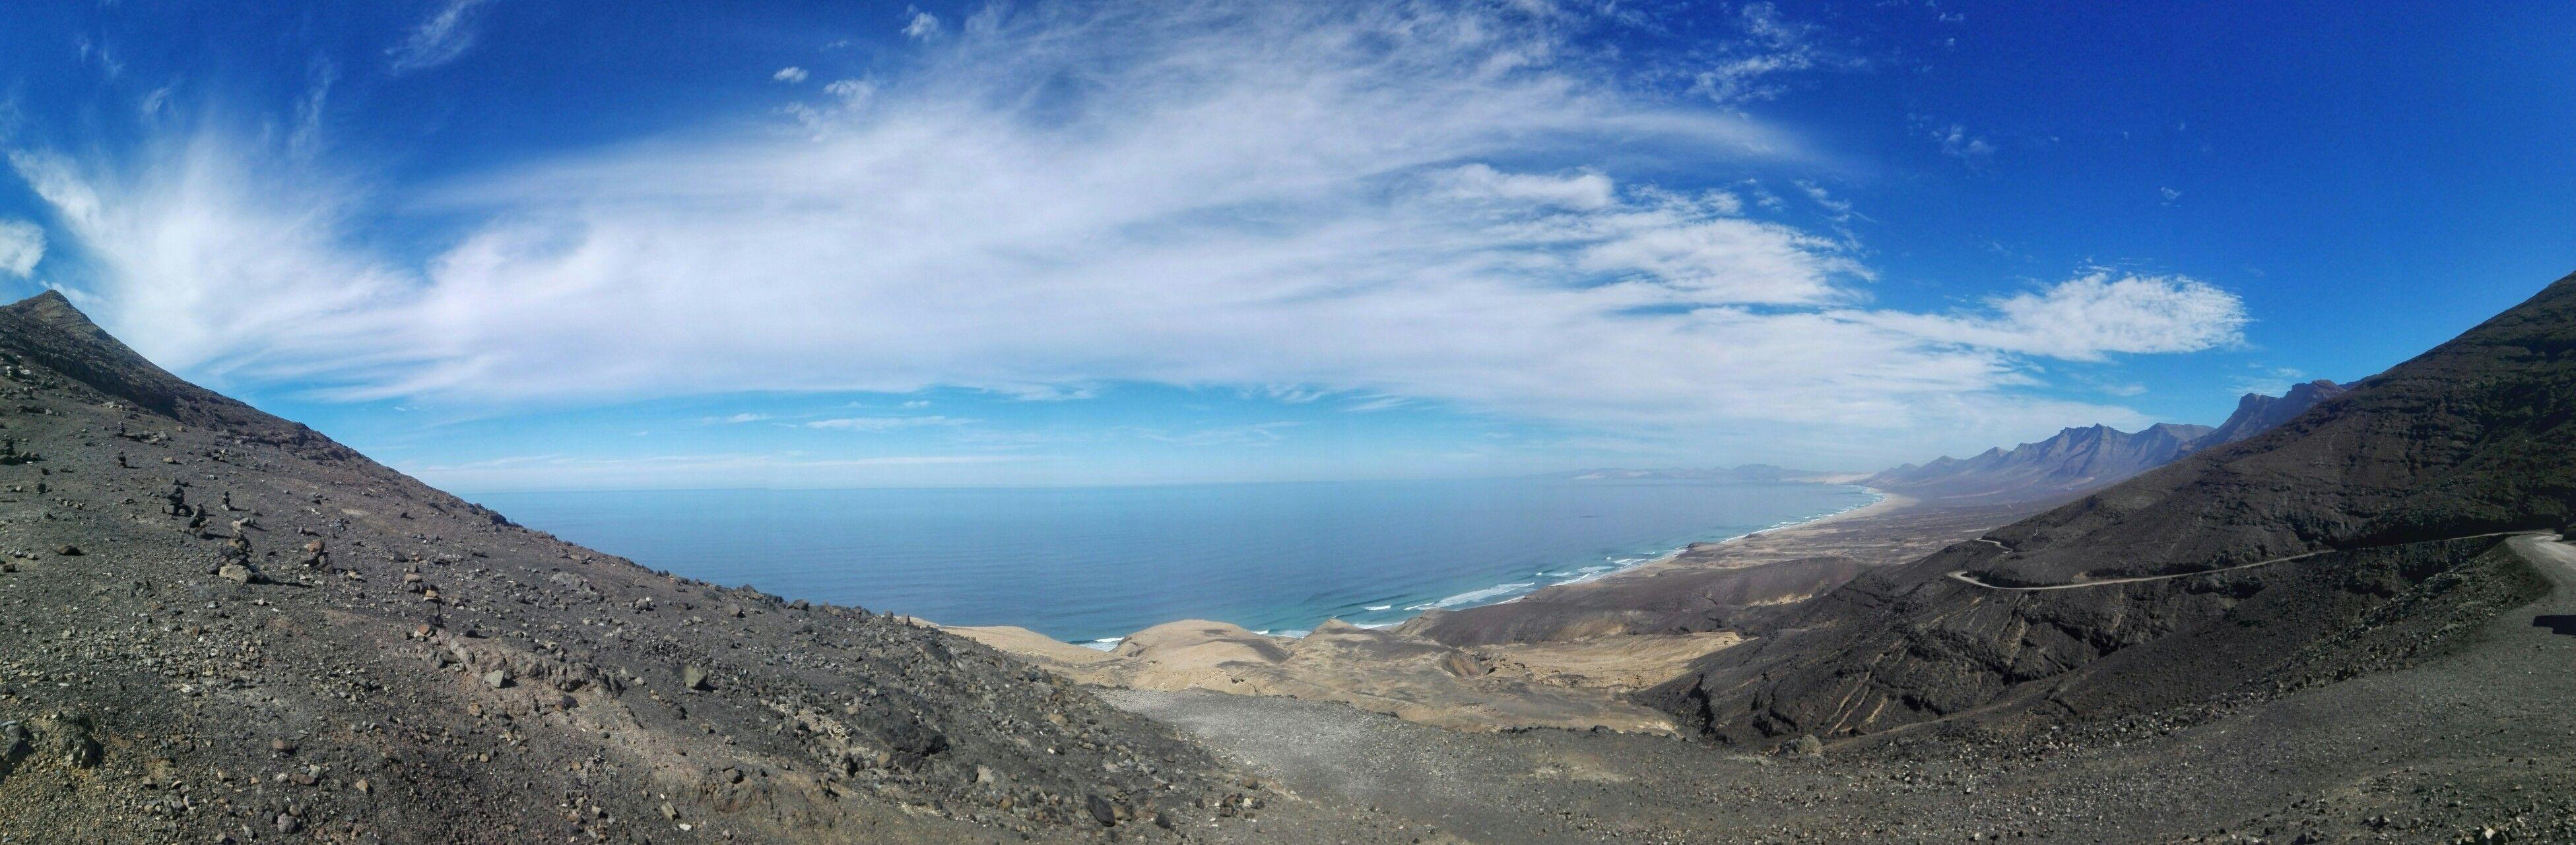 Cofete  Fuerteventura novembre 2016 Pic Beatrice C.